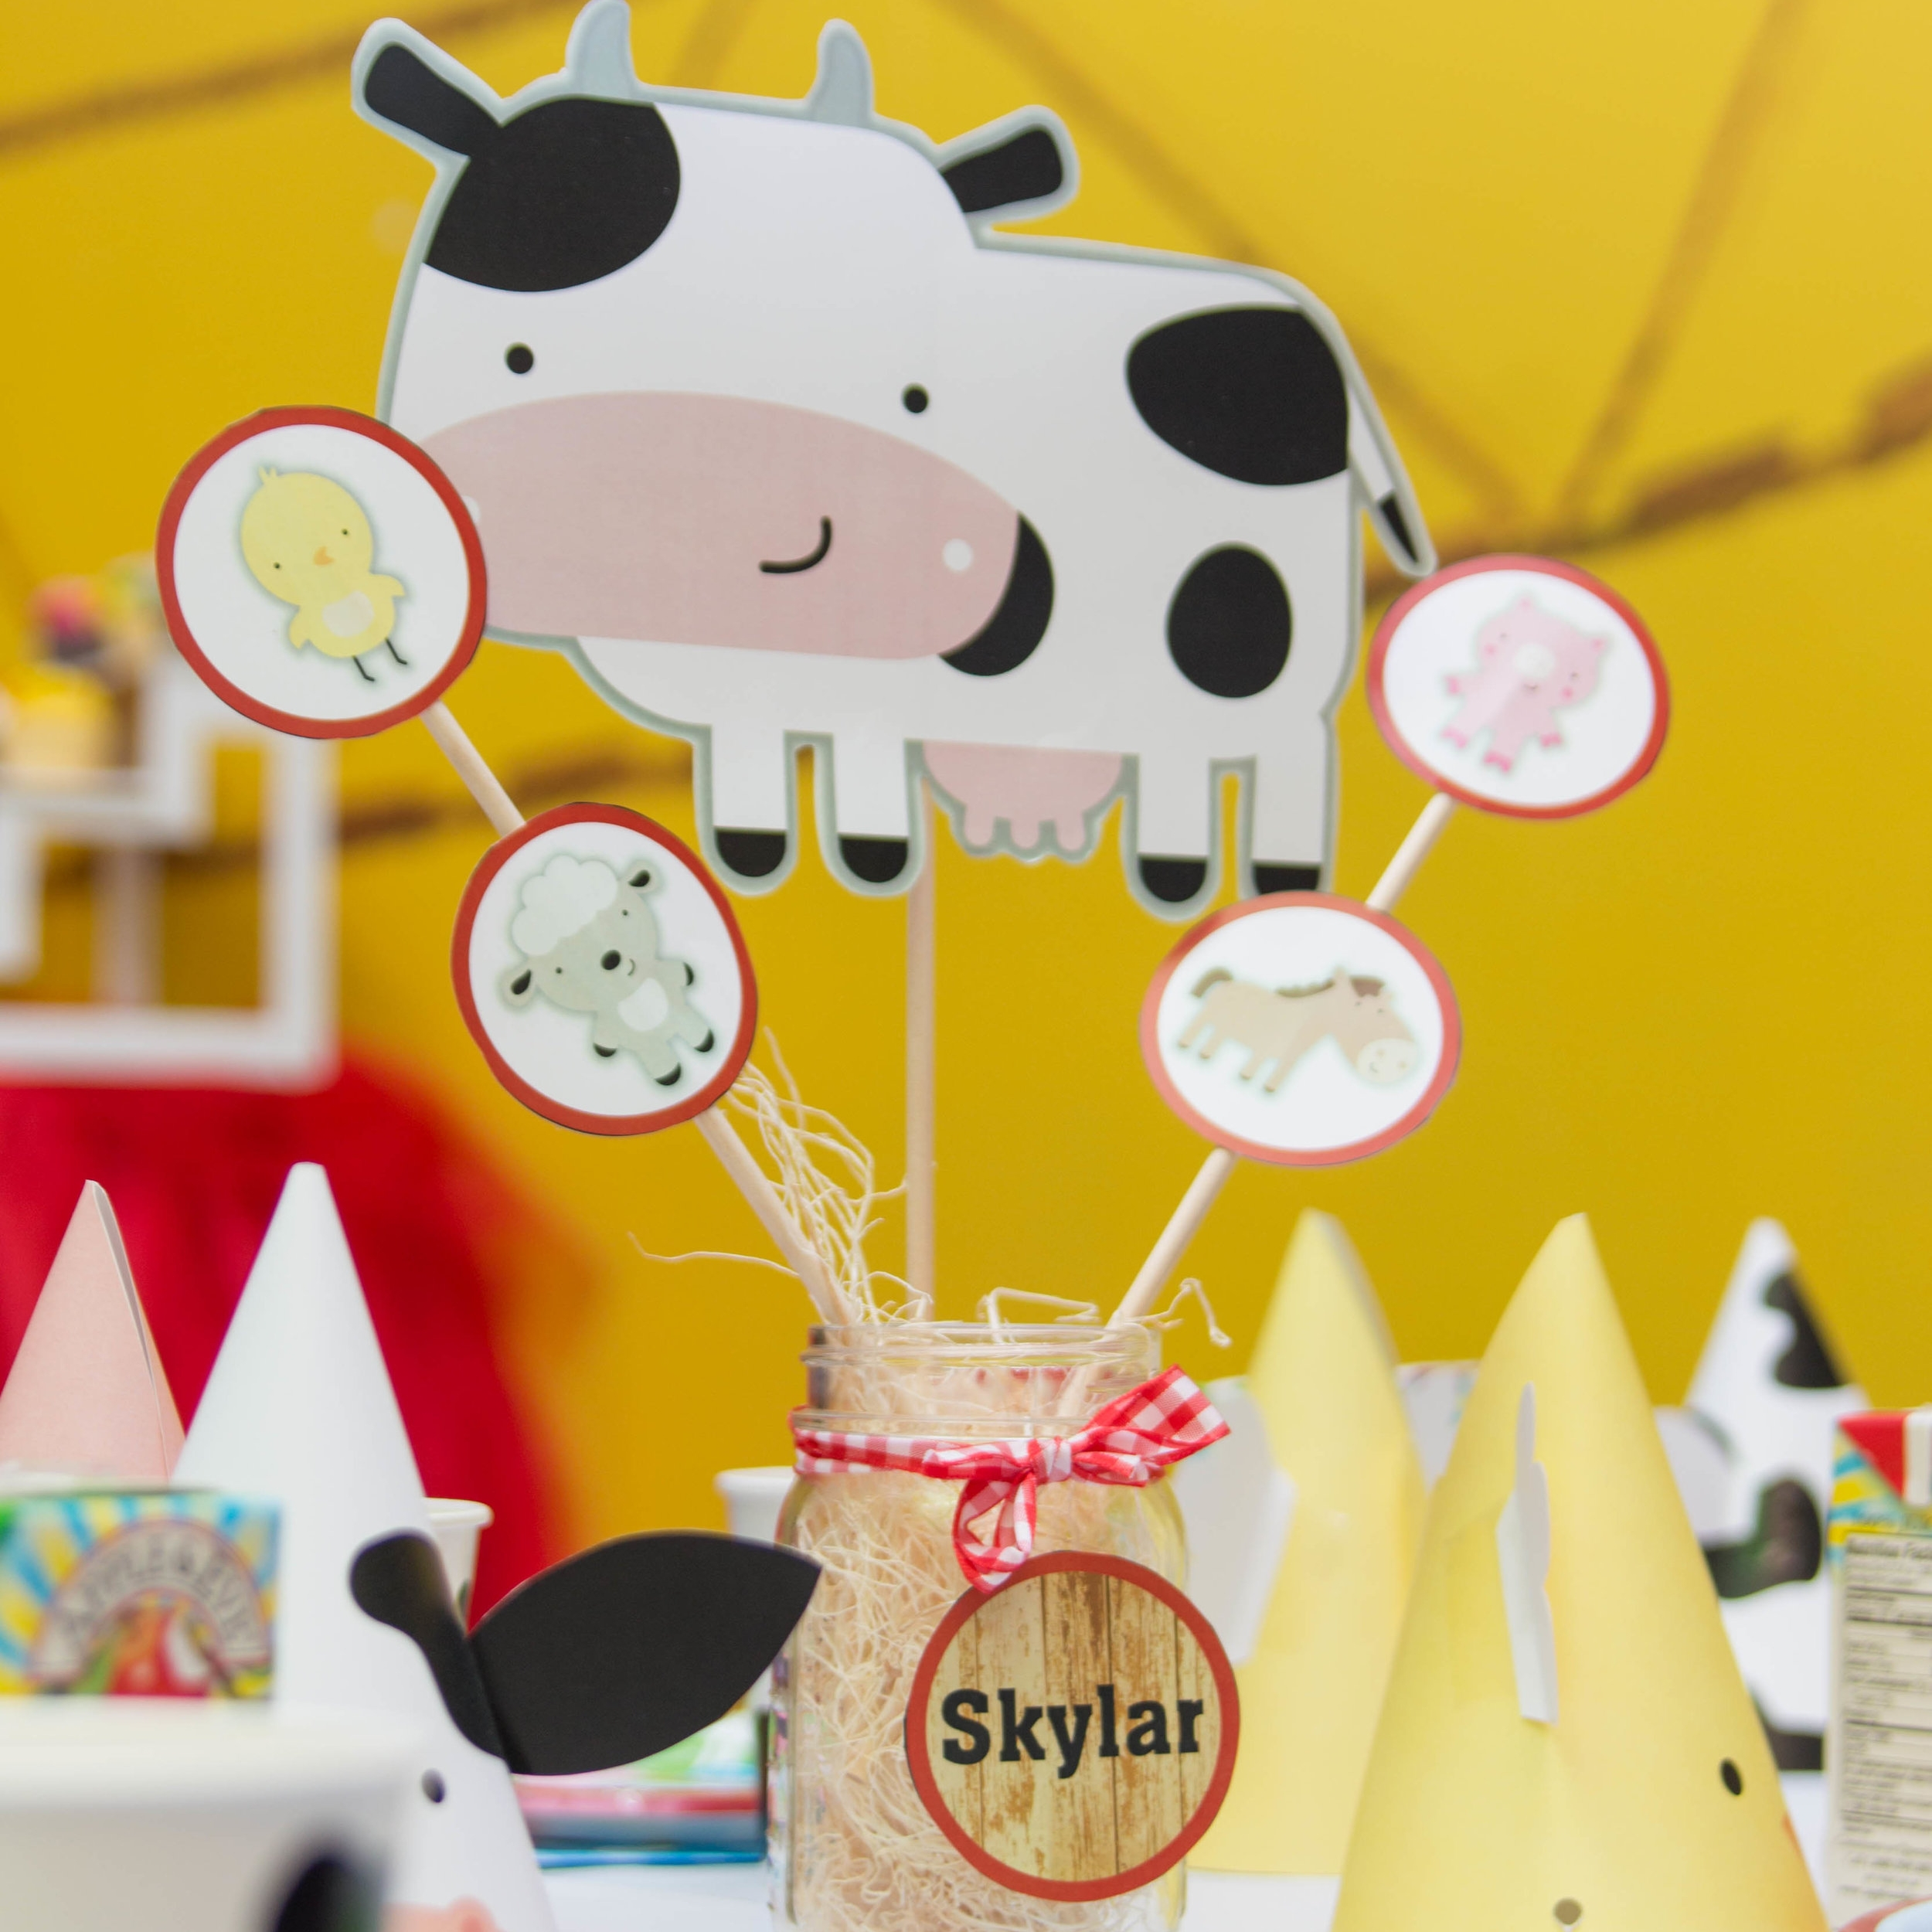 Skylar 2nd Birthday-2 (2).jpg